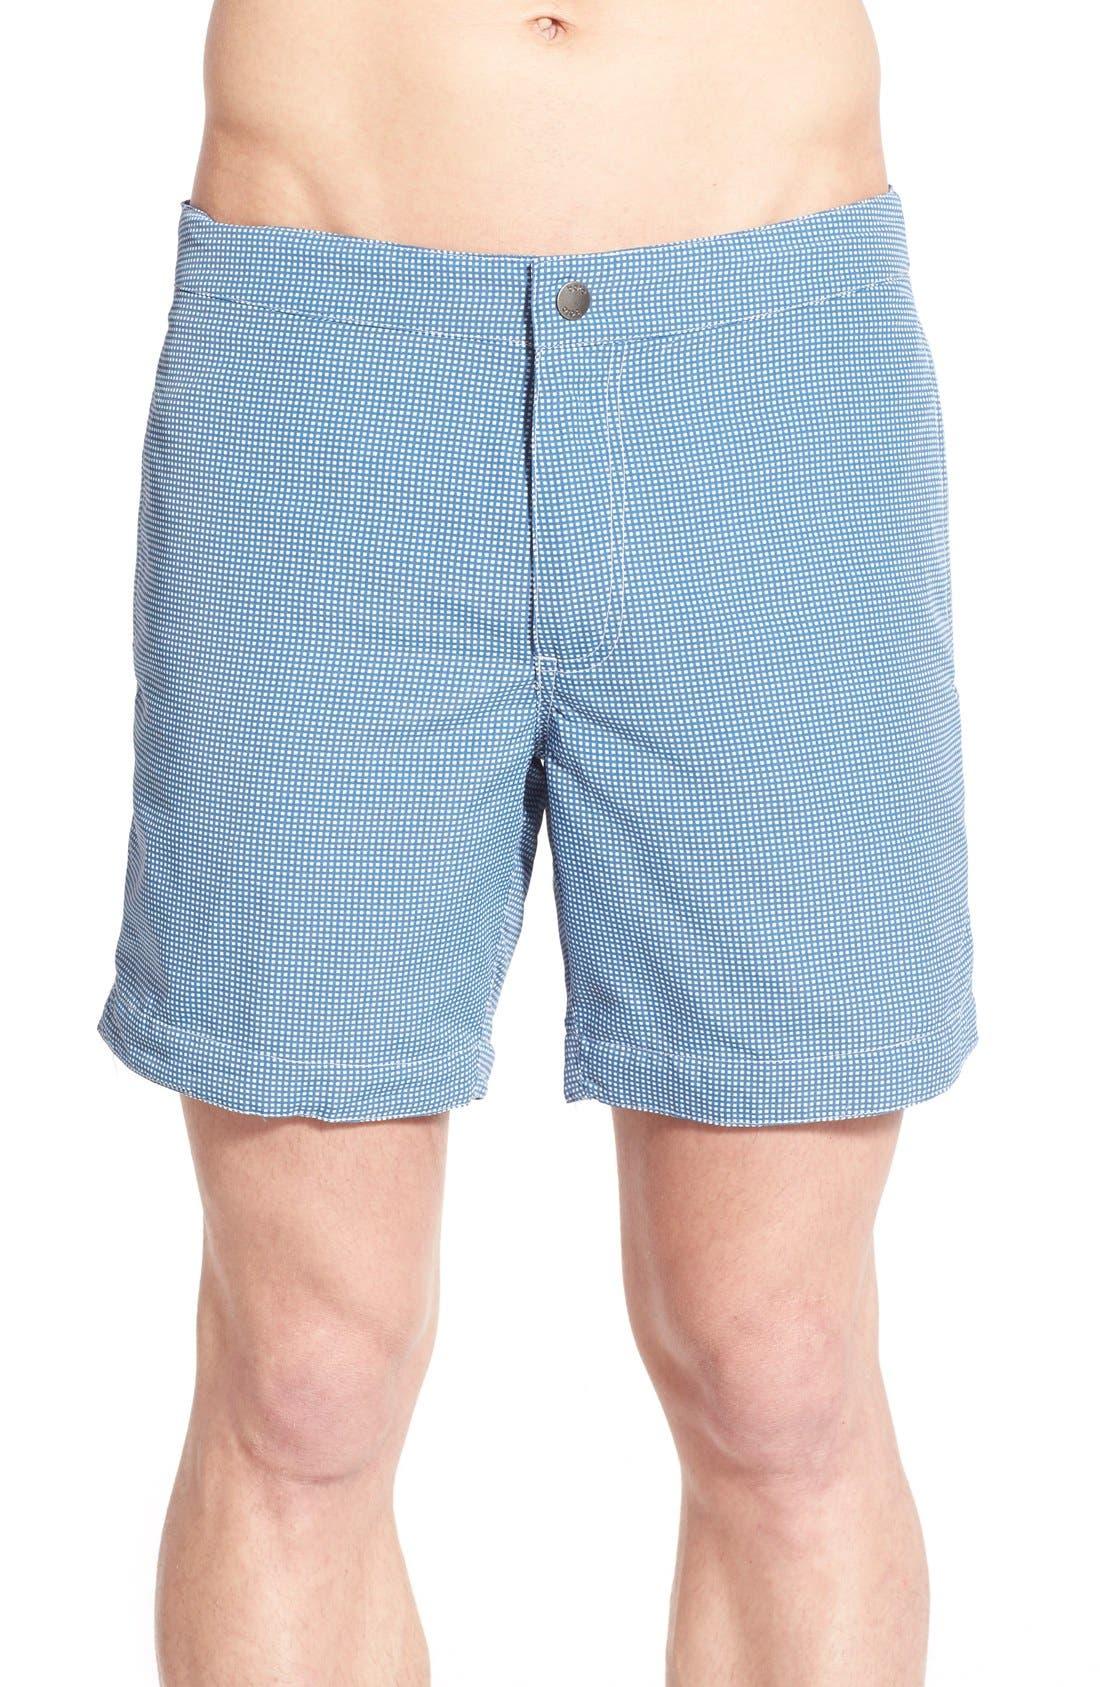 Aruba Tailored Fit Microcheck Swim Trunks,                             Main thumbnail 1, color,                             Micro Square Ash Blue